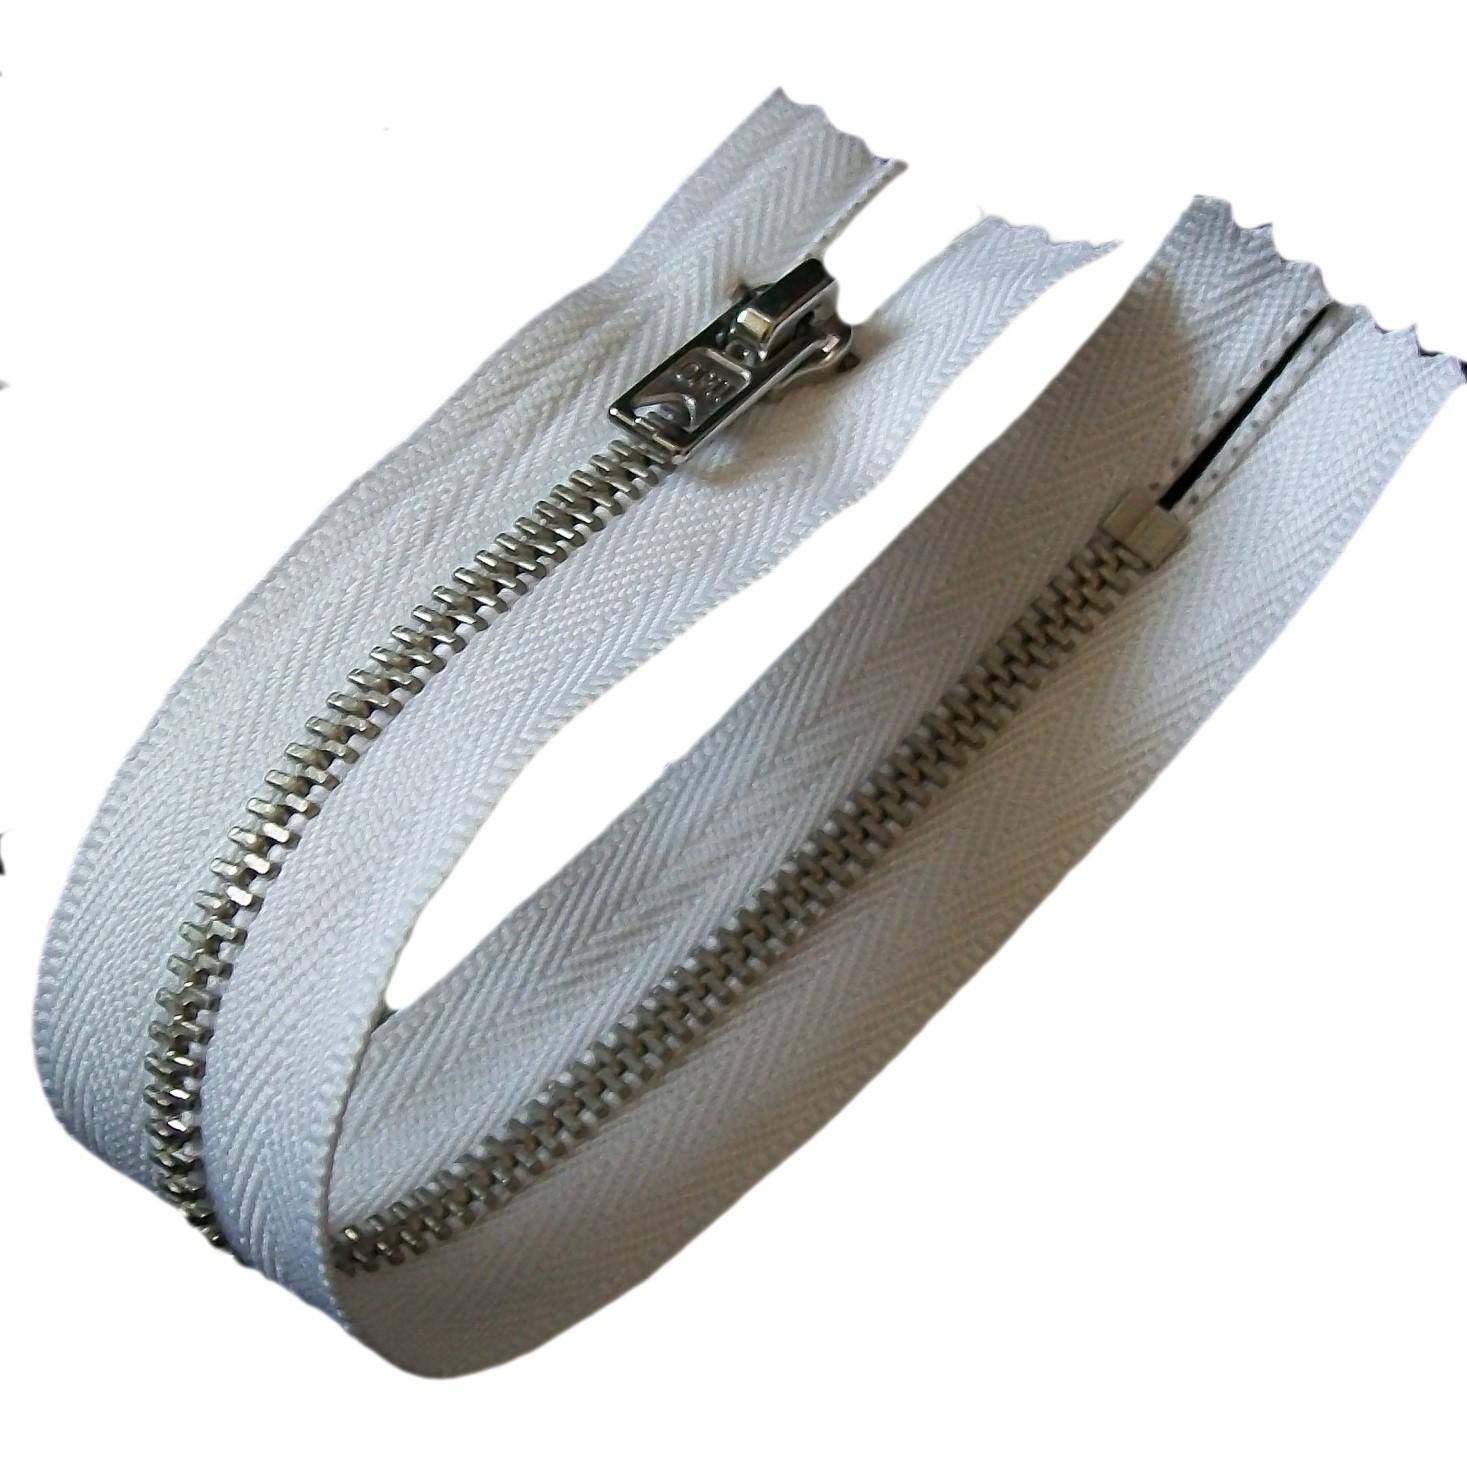 Silver Metal Trouser Jeans Zip Zipper 9 inch White